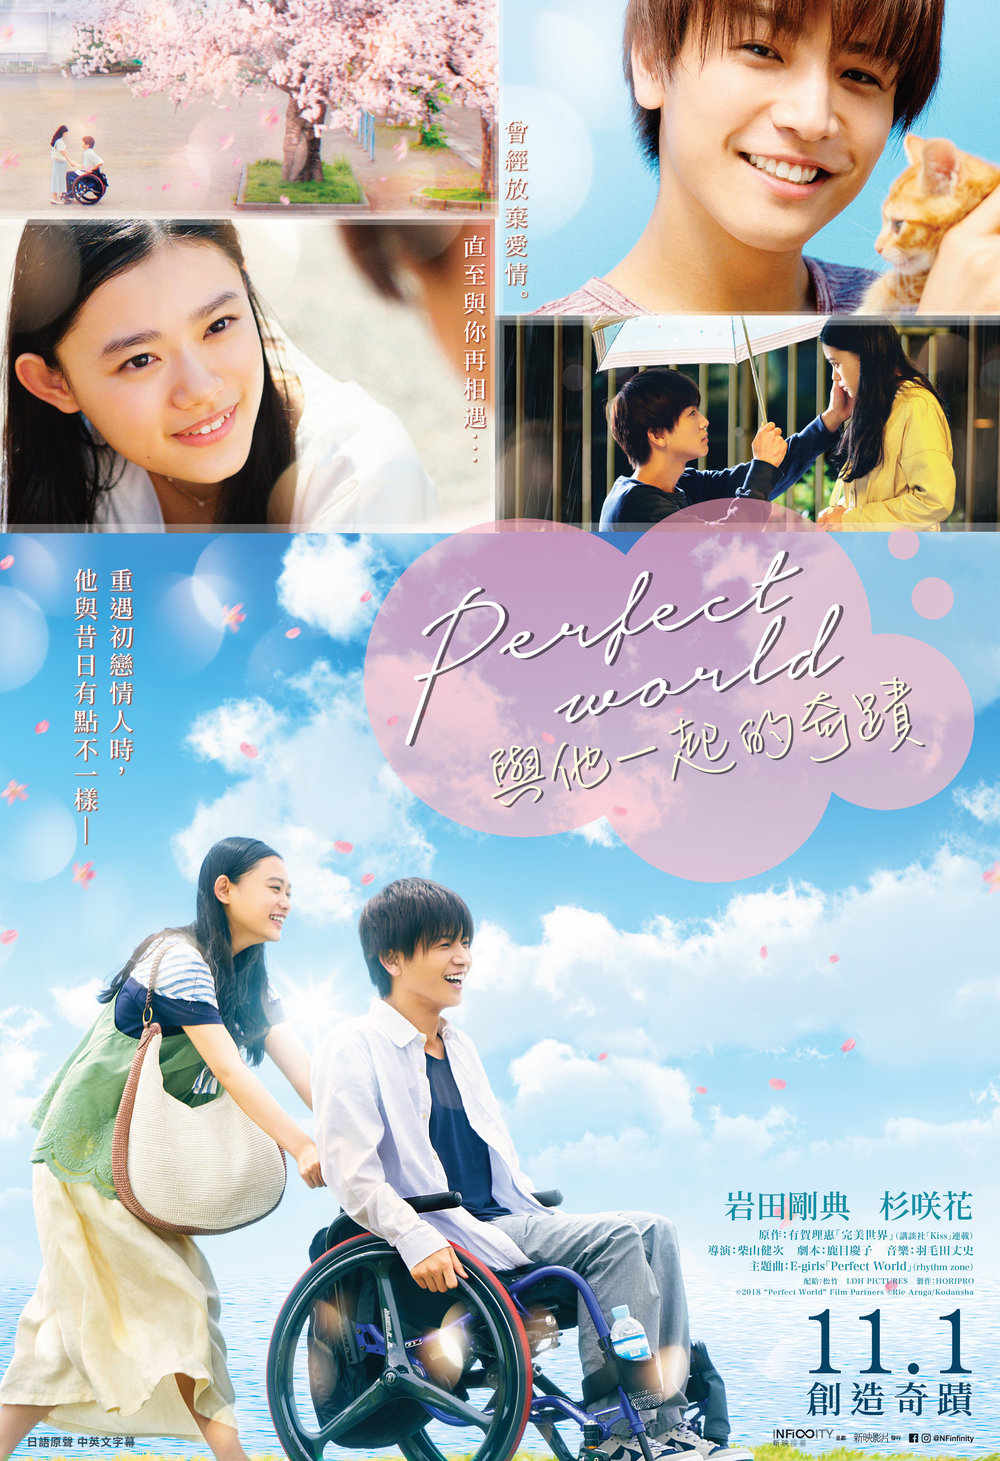 《Perfect world~與他一起的奇蹟~》11月1日上映